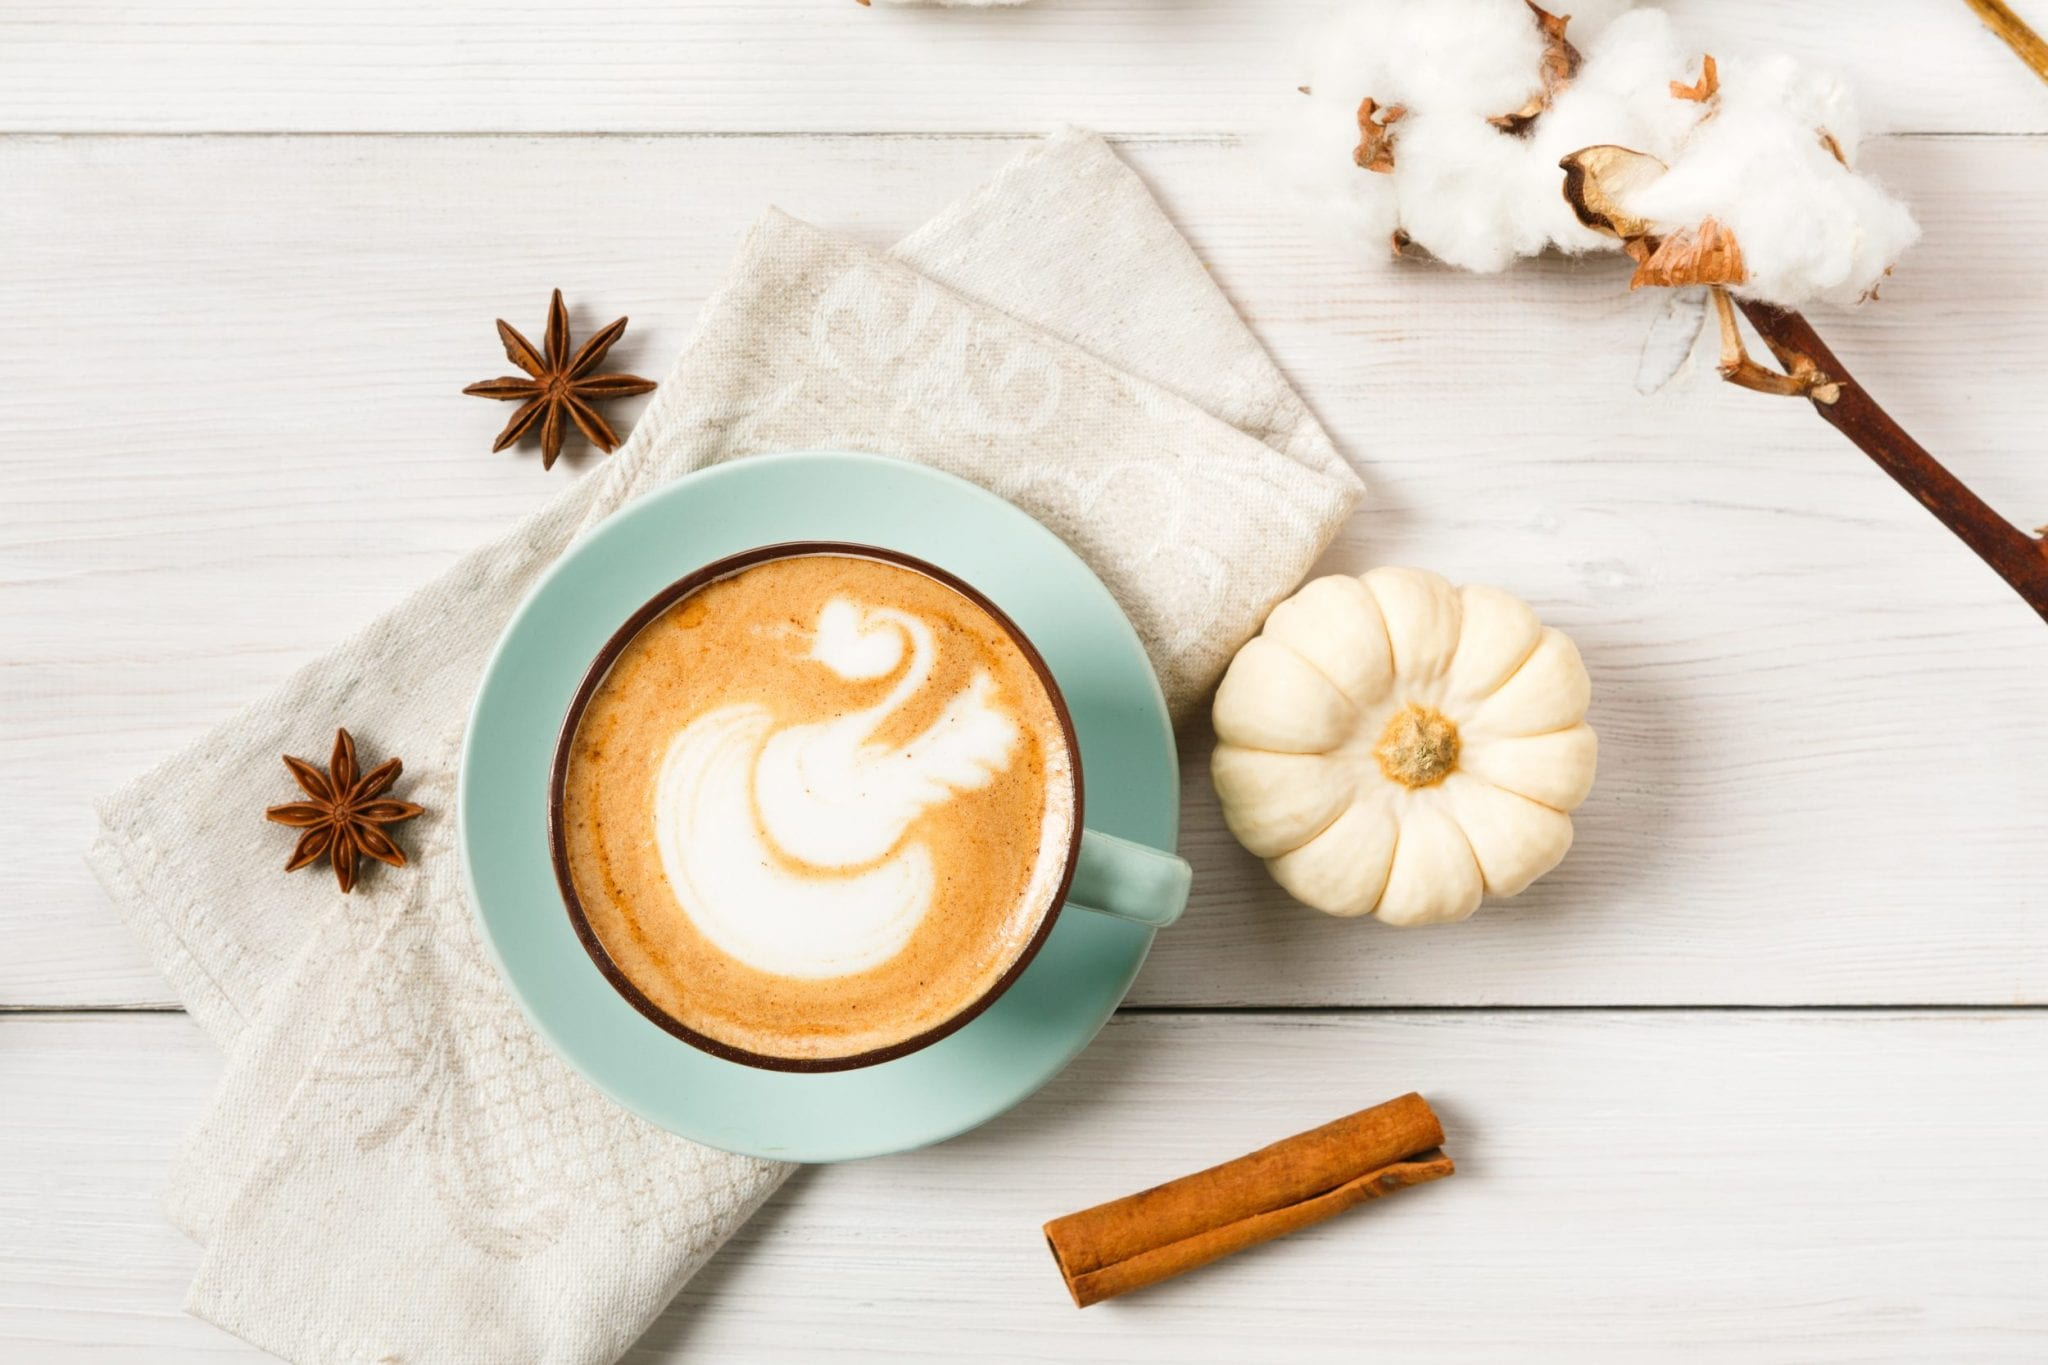 Pumpkin spice latte, guiltless pumpkin spice latte, latte, coffee, healthy pumpkin spice latte, pumpkin spice latte recipe, recipes, healthy lattes recipes, fall recipes,